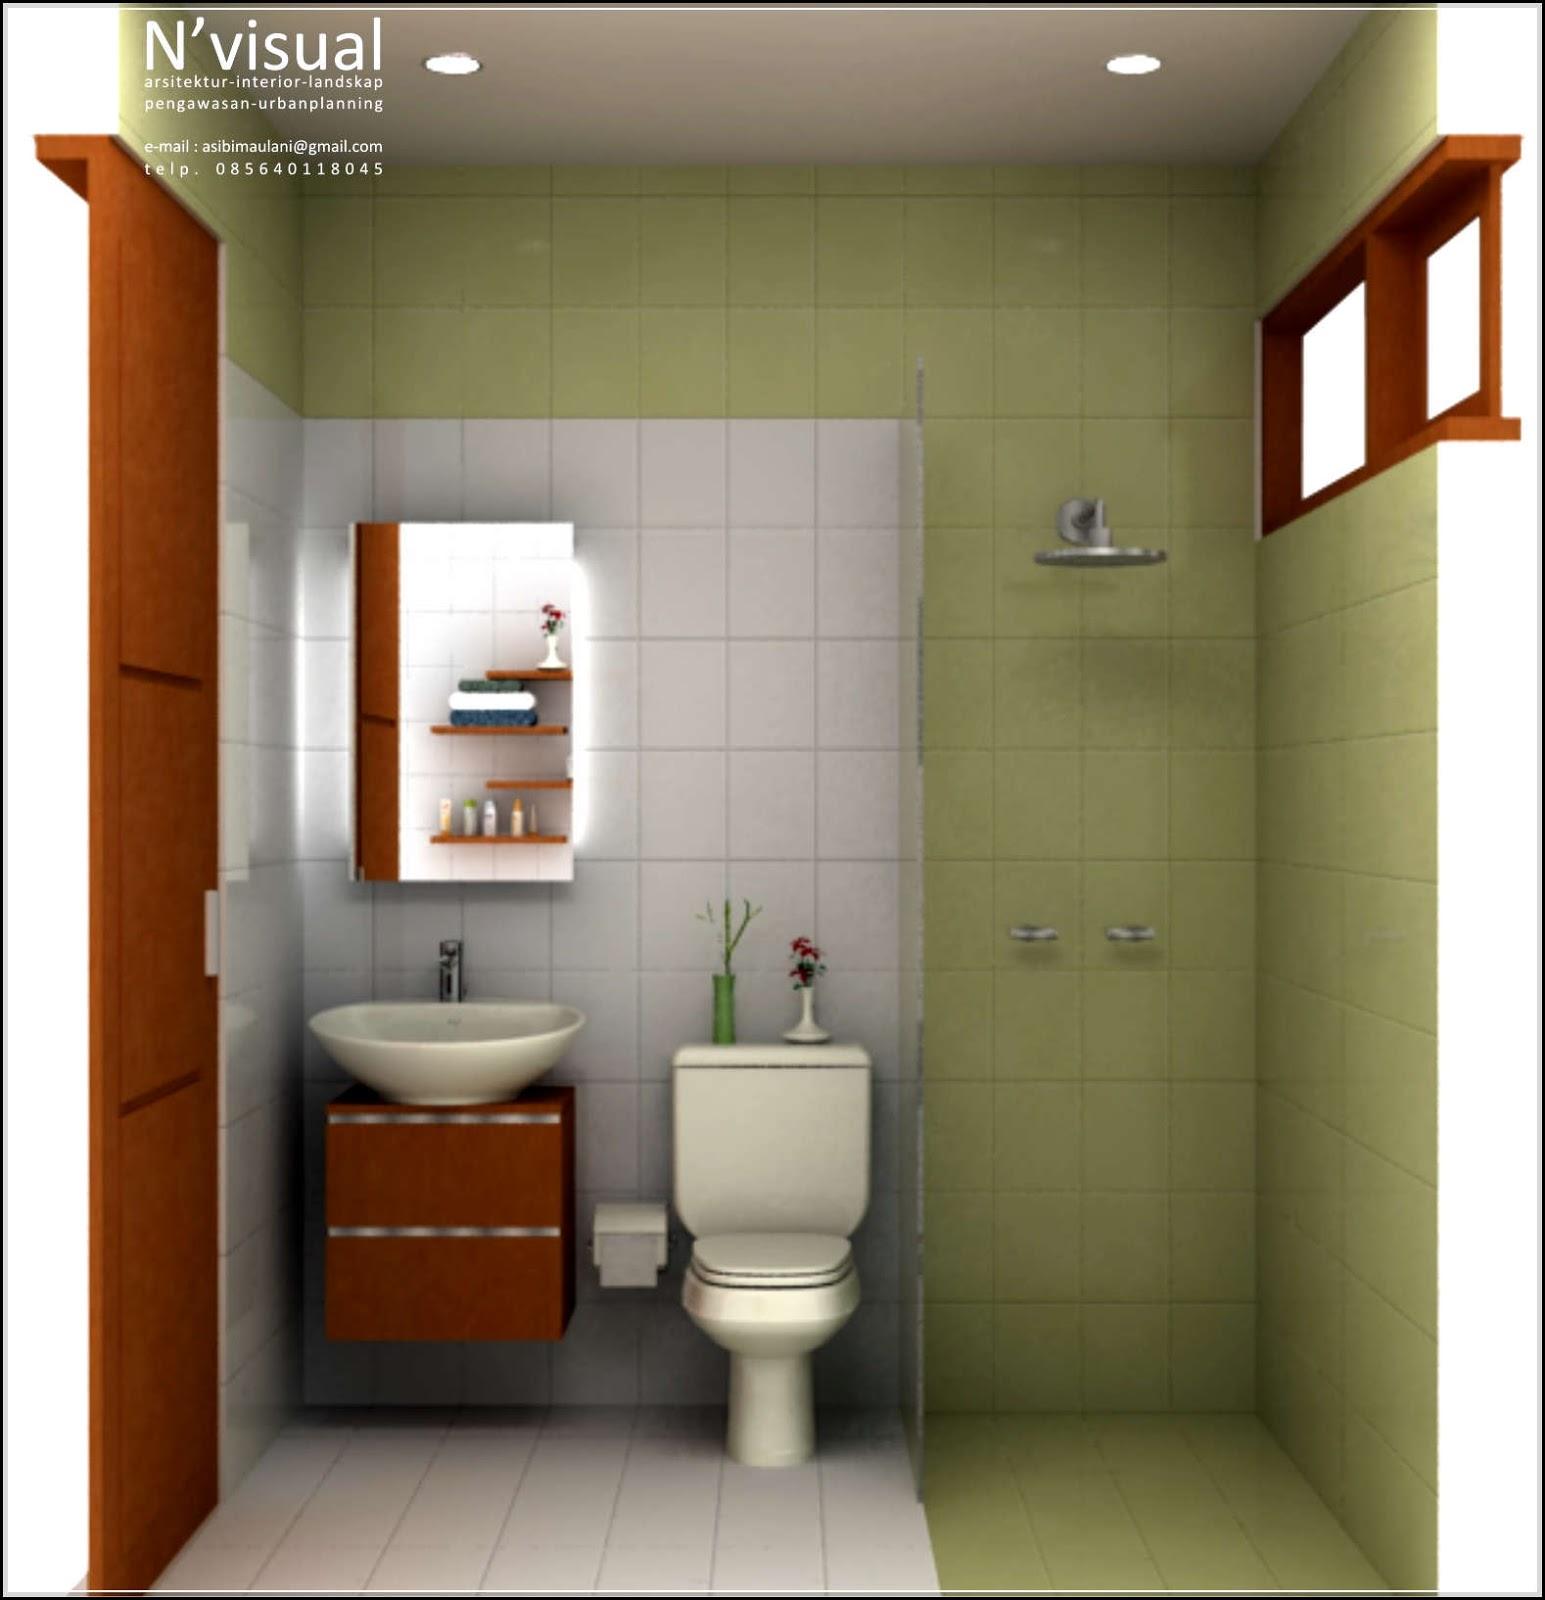 42 Desain Kamar Mandi Sempit Minimalis Ukuran Kecil Yang ...